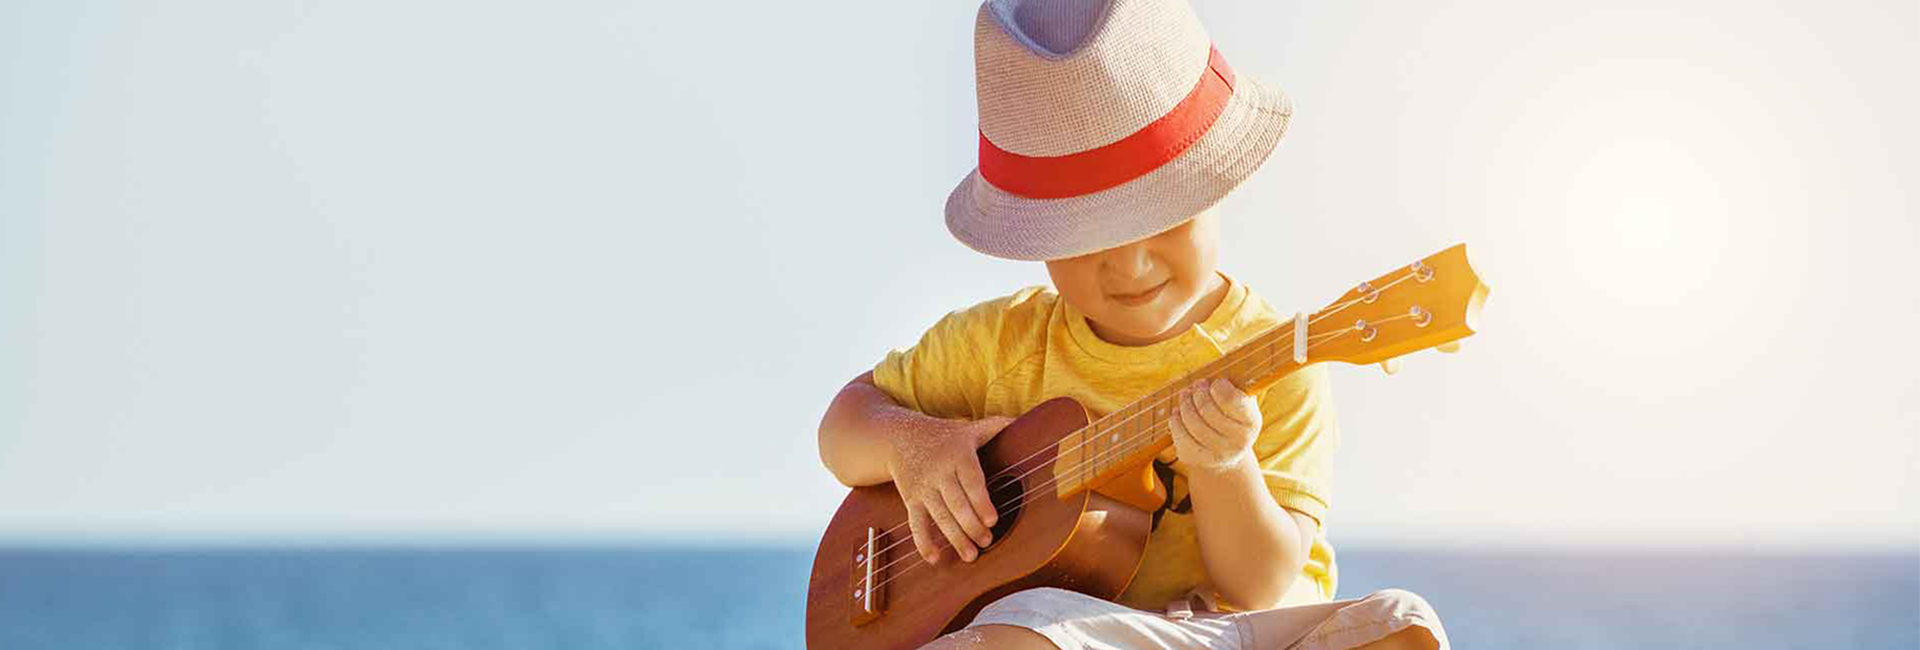 Weekend Dziecka 2020 - 2 dzieci do lat 12 gratis*